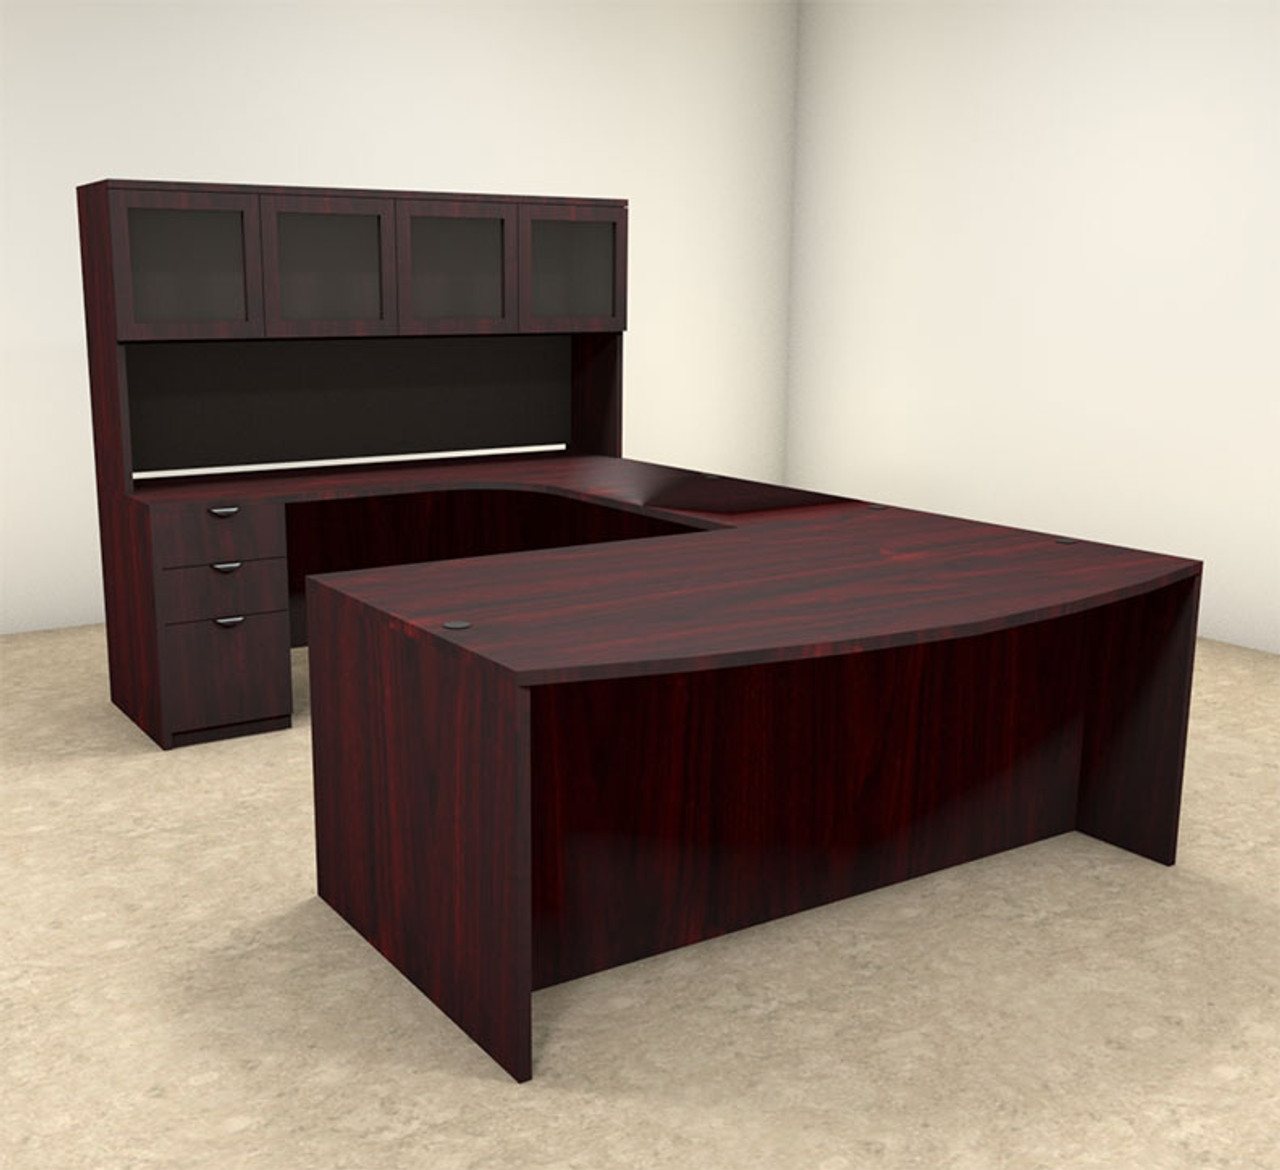 5pc u shaped modern contemporary executive office desk set of con u3 h2o furniture. Black Bedroom Furniture Sets. Home Design Ideas